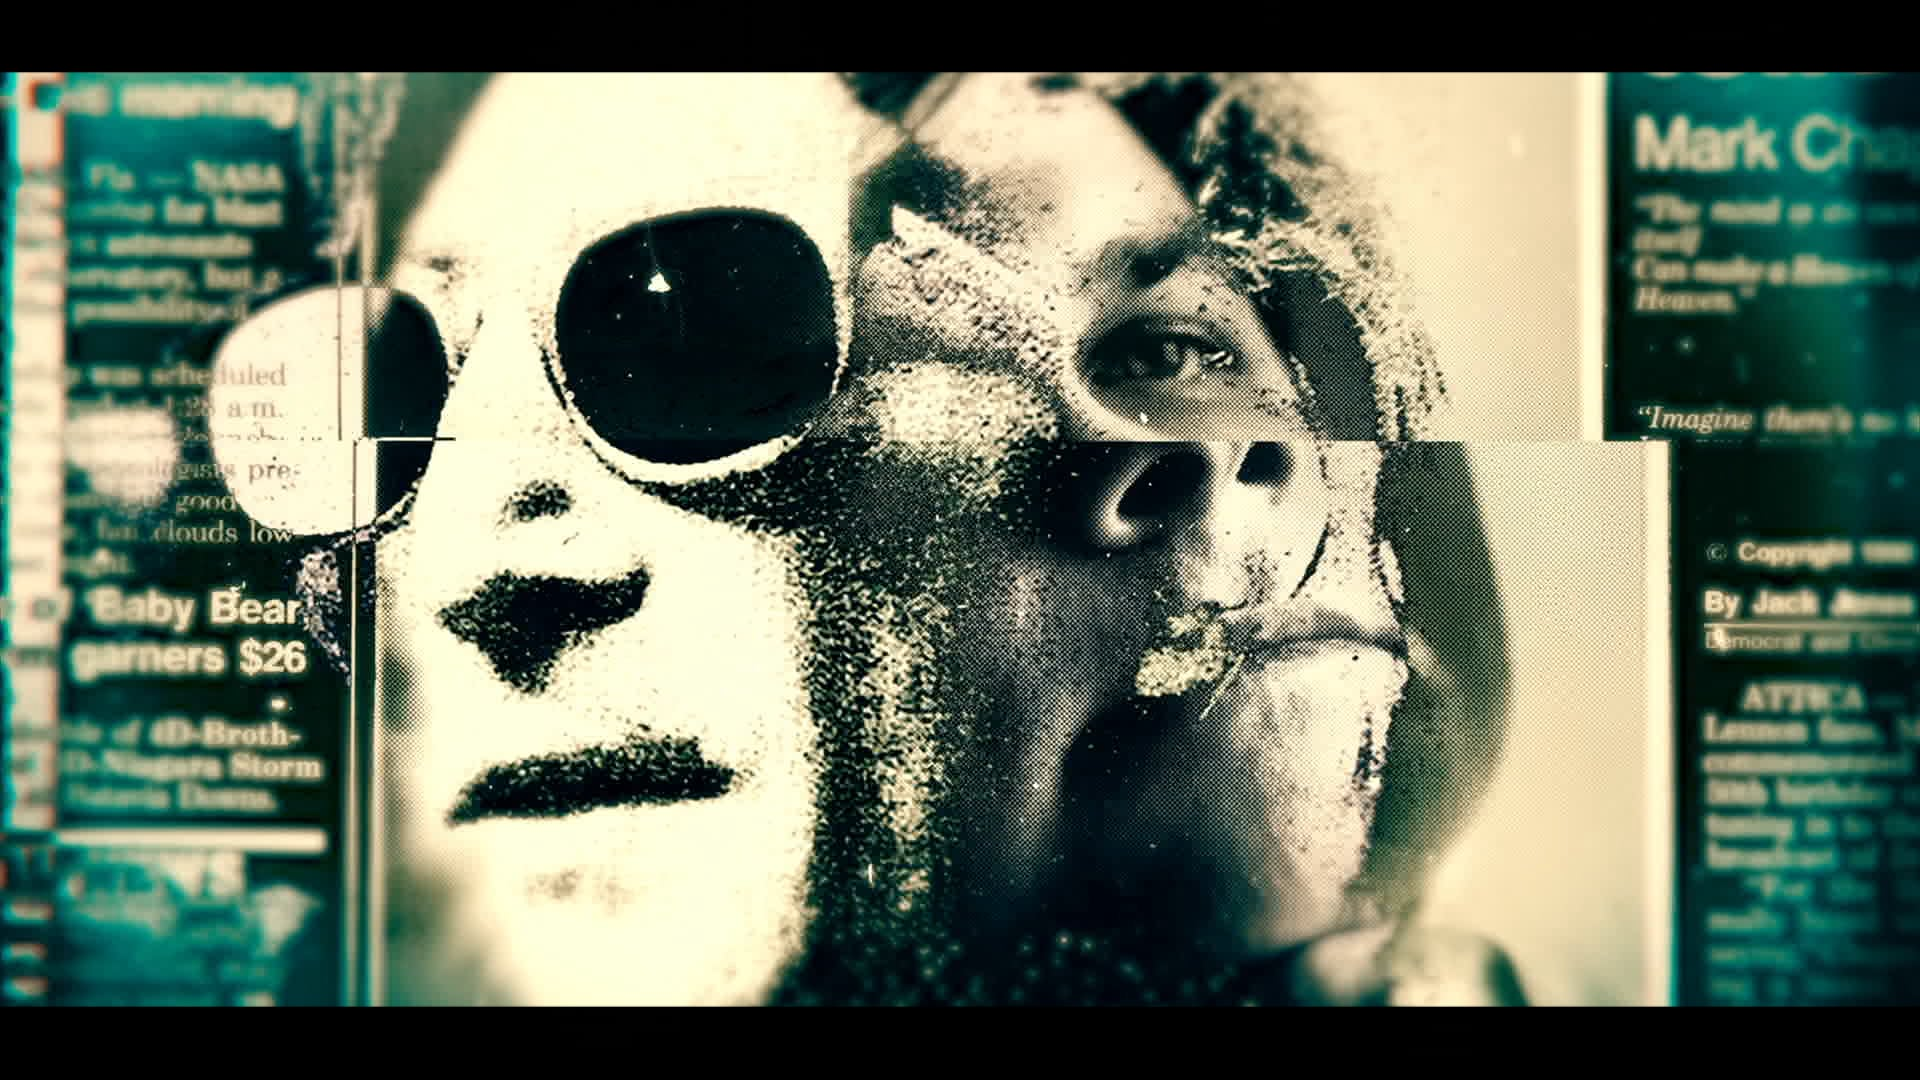 The Assasination of John Lennon